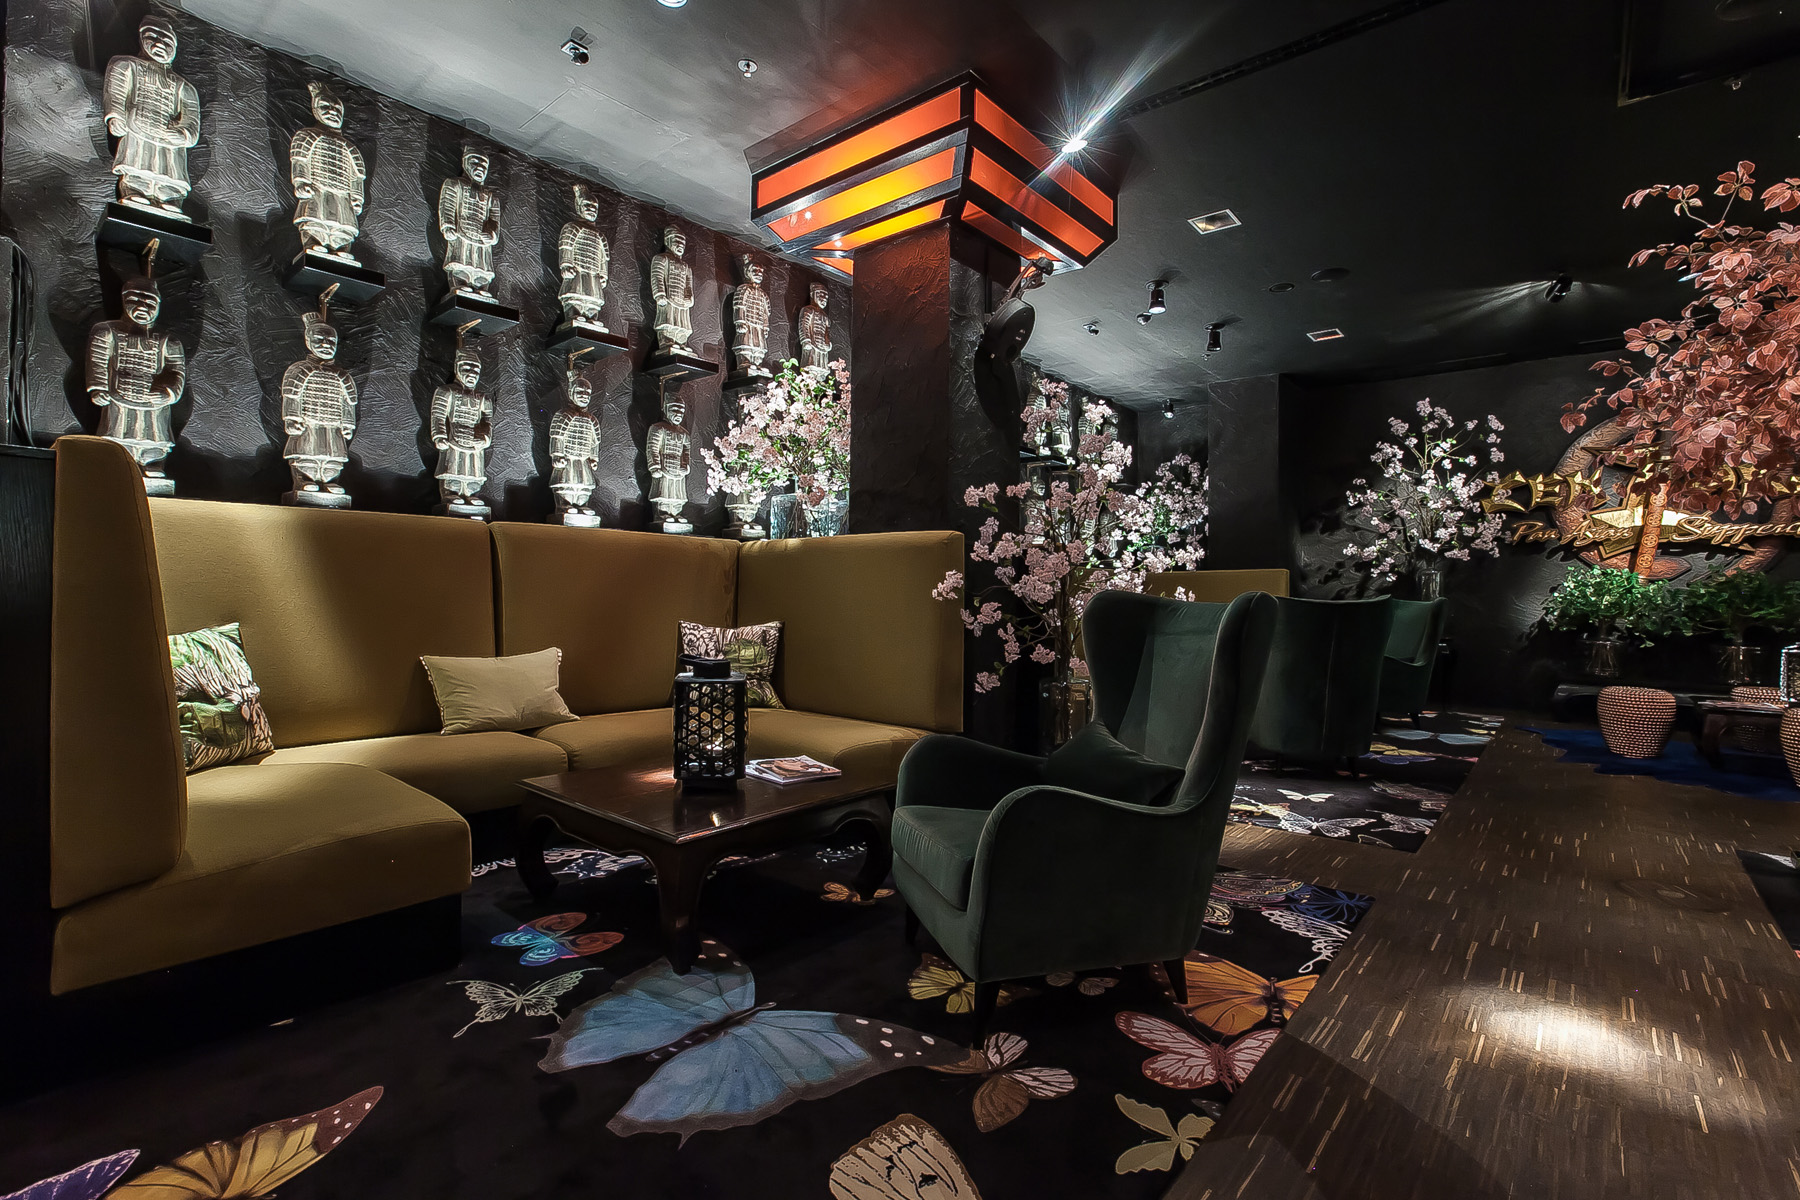 fotograf frankfurt ambiente indoor architektur praxis werbefotograf nikita kulikov. Black Bedroom Furniture Sets. Home Design Ideas